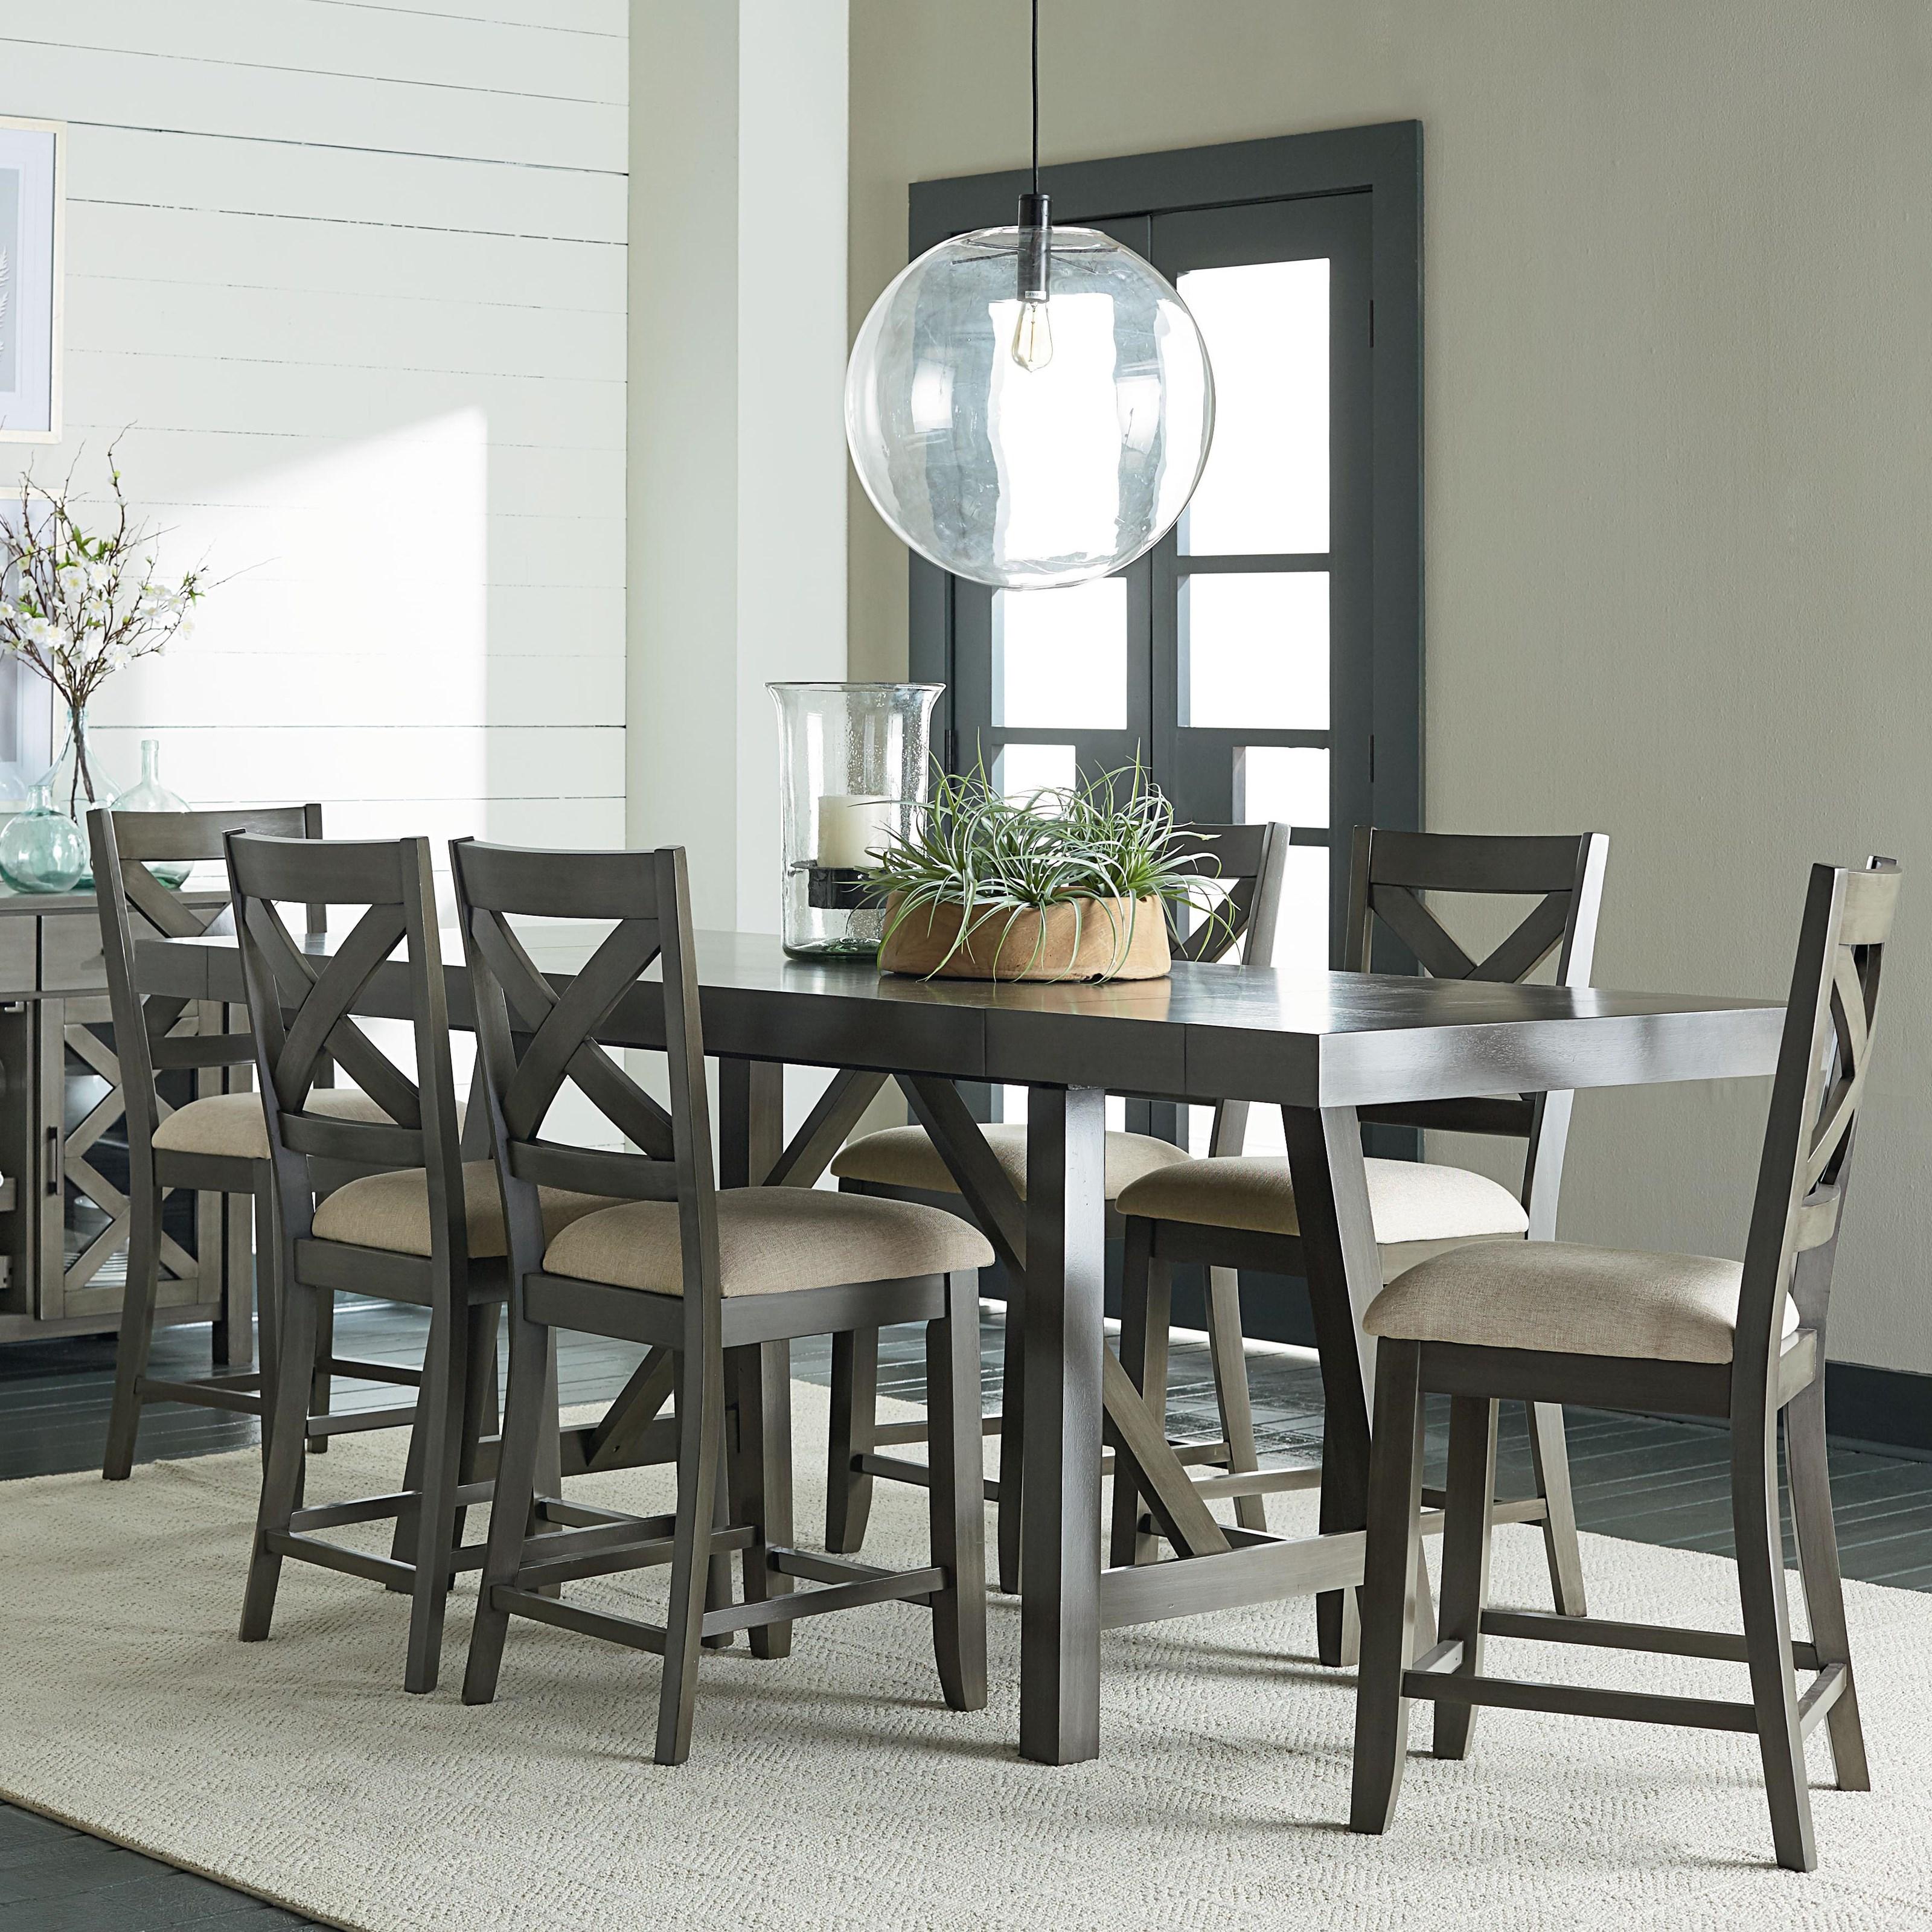 Standard Furniture Brooklyn 5 Piece Counter Height Dining: Standard Furniture Omaha Grey Counter Height 5-Piece